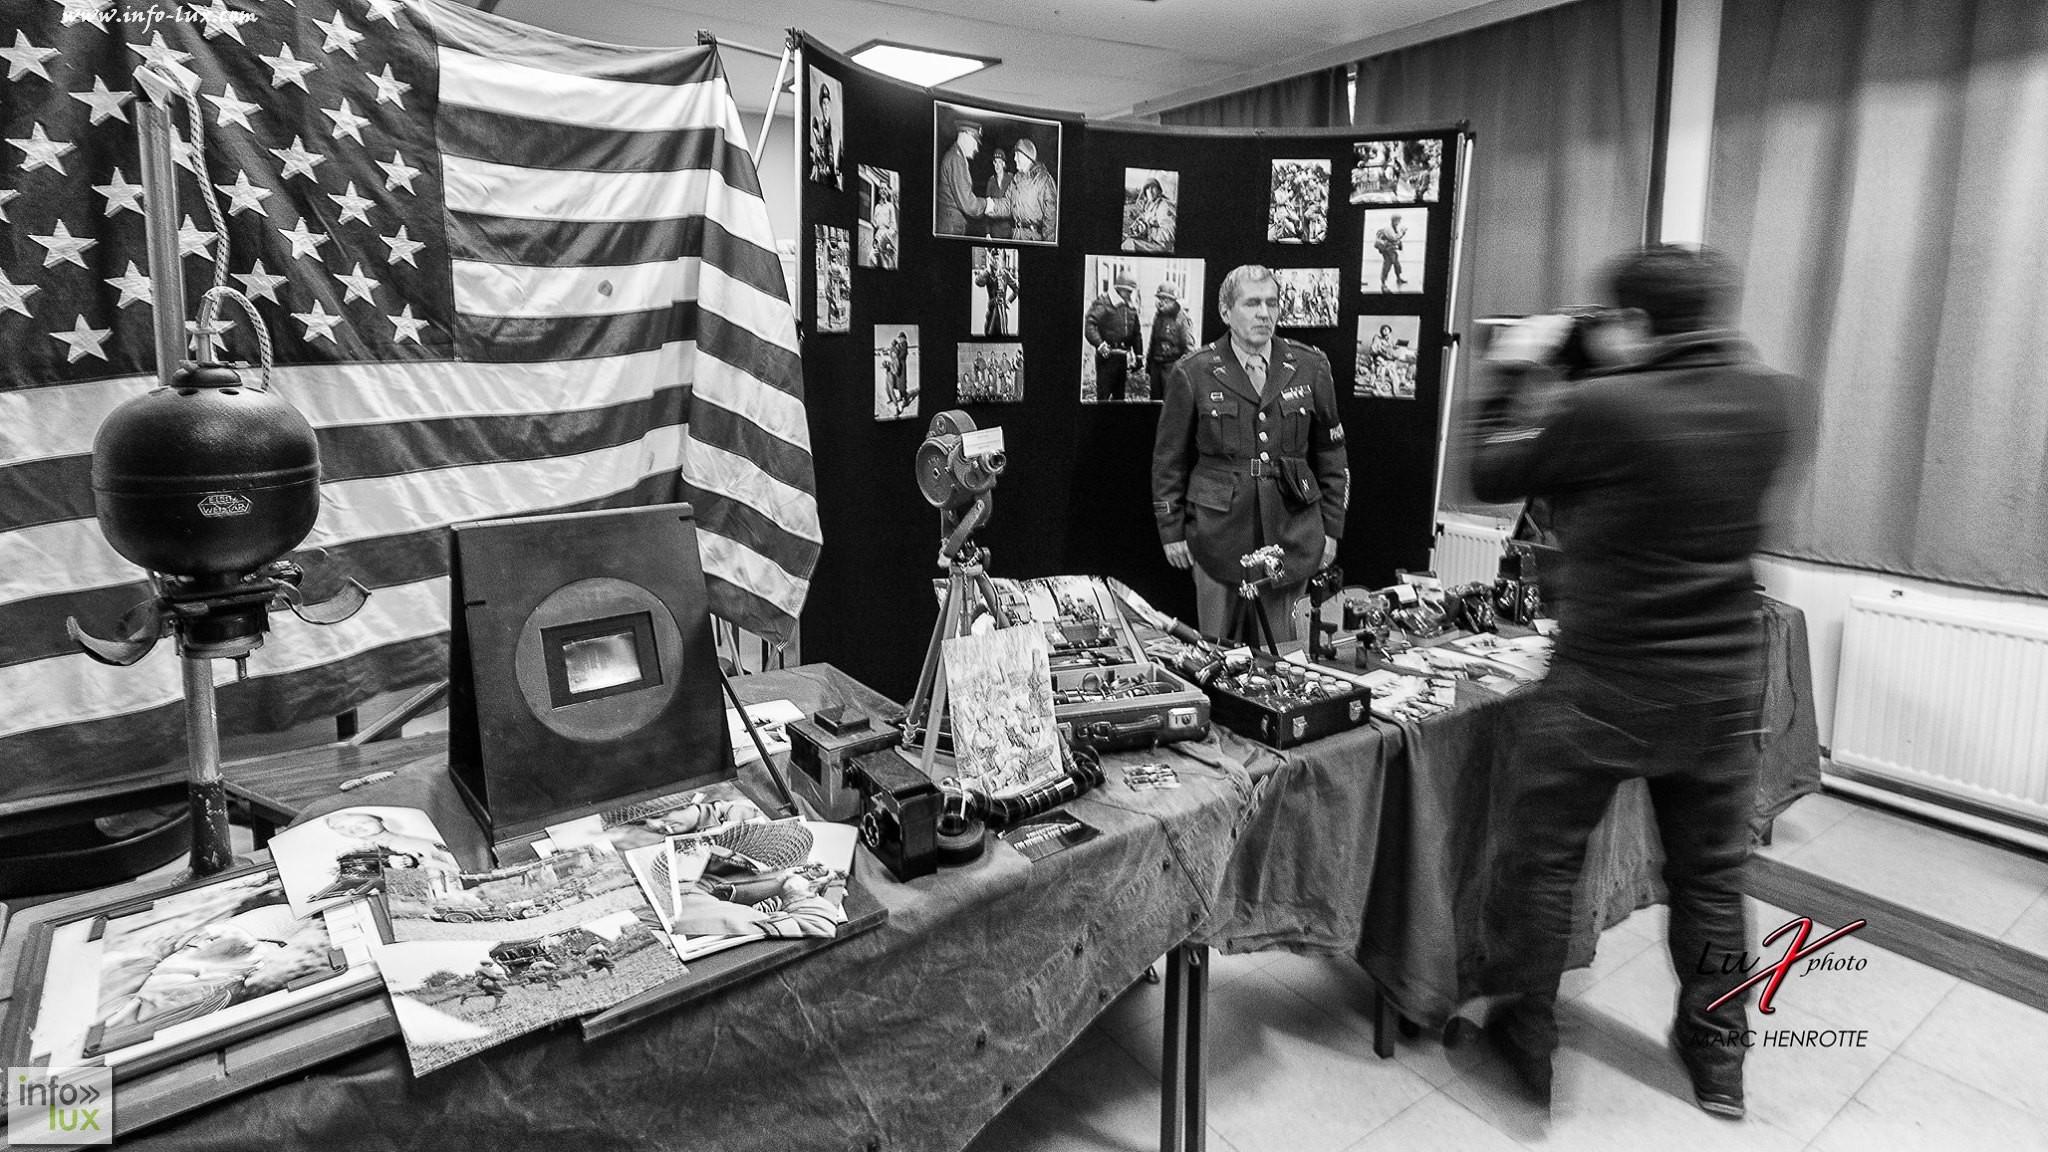 images/stories/PHOTOSREP/Bastogne/70ansMarc1/infoluxBAS007